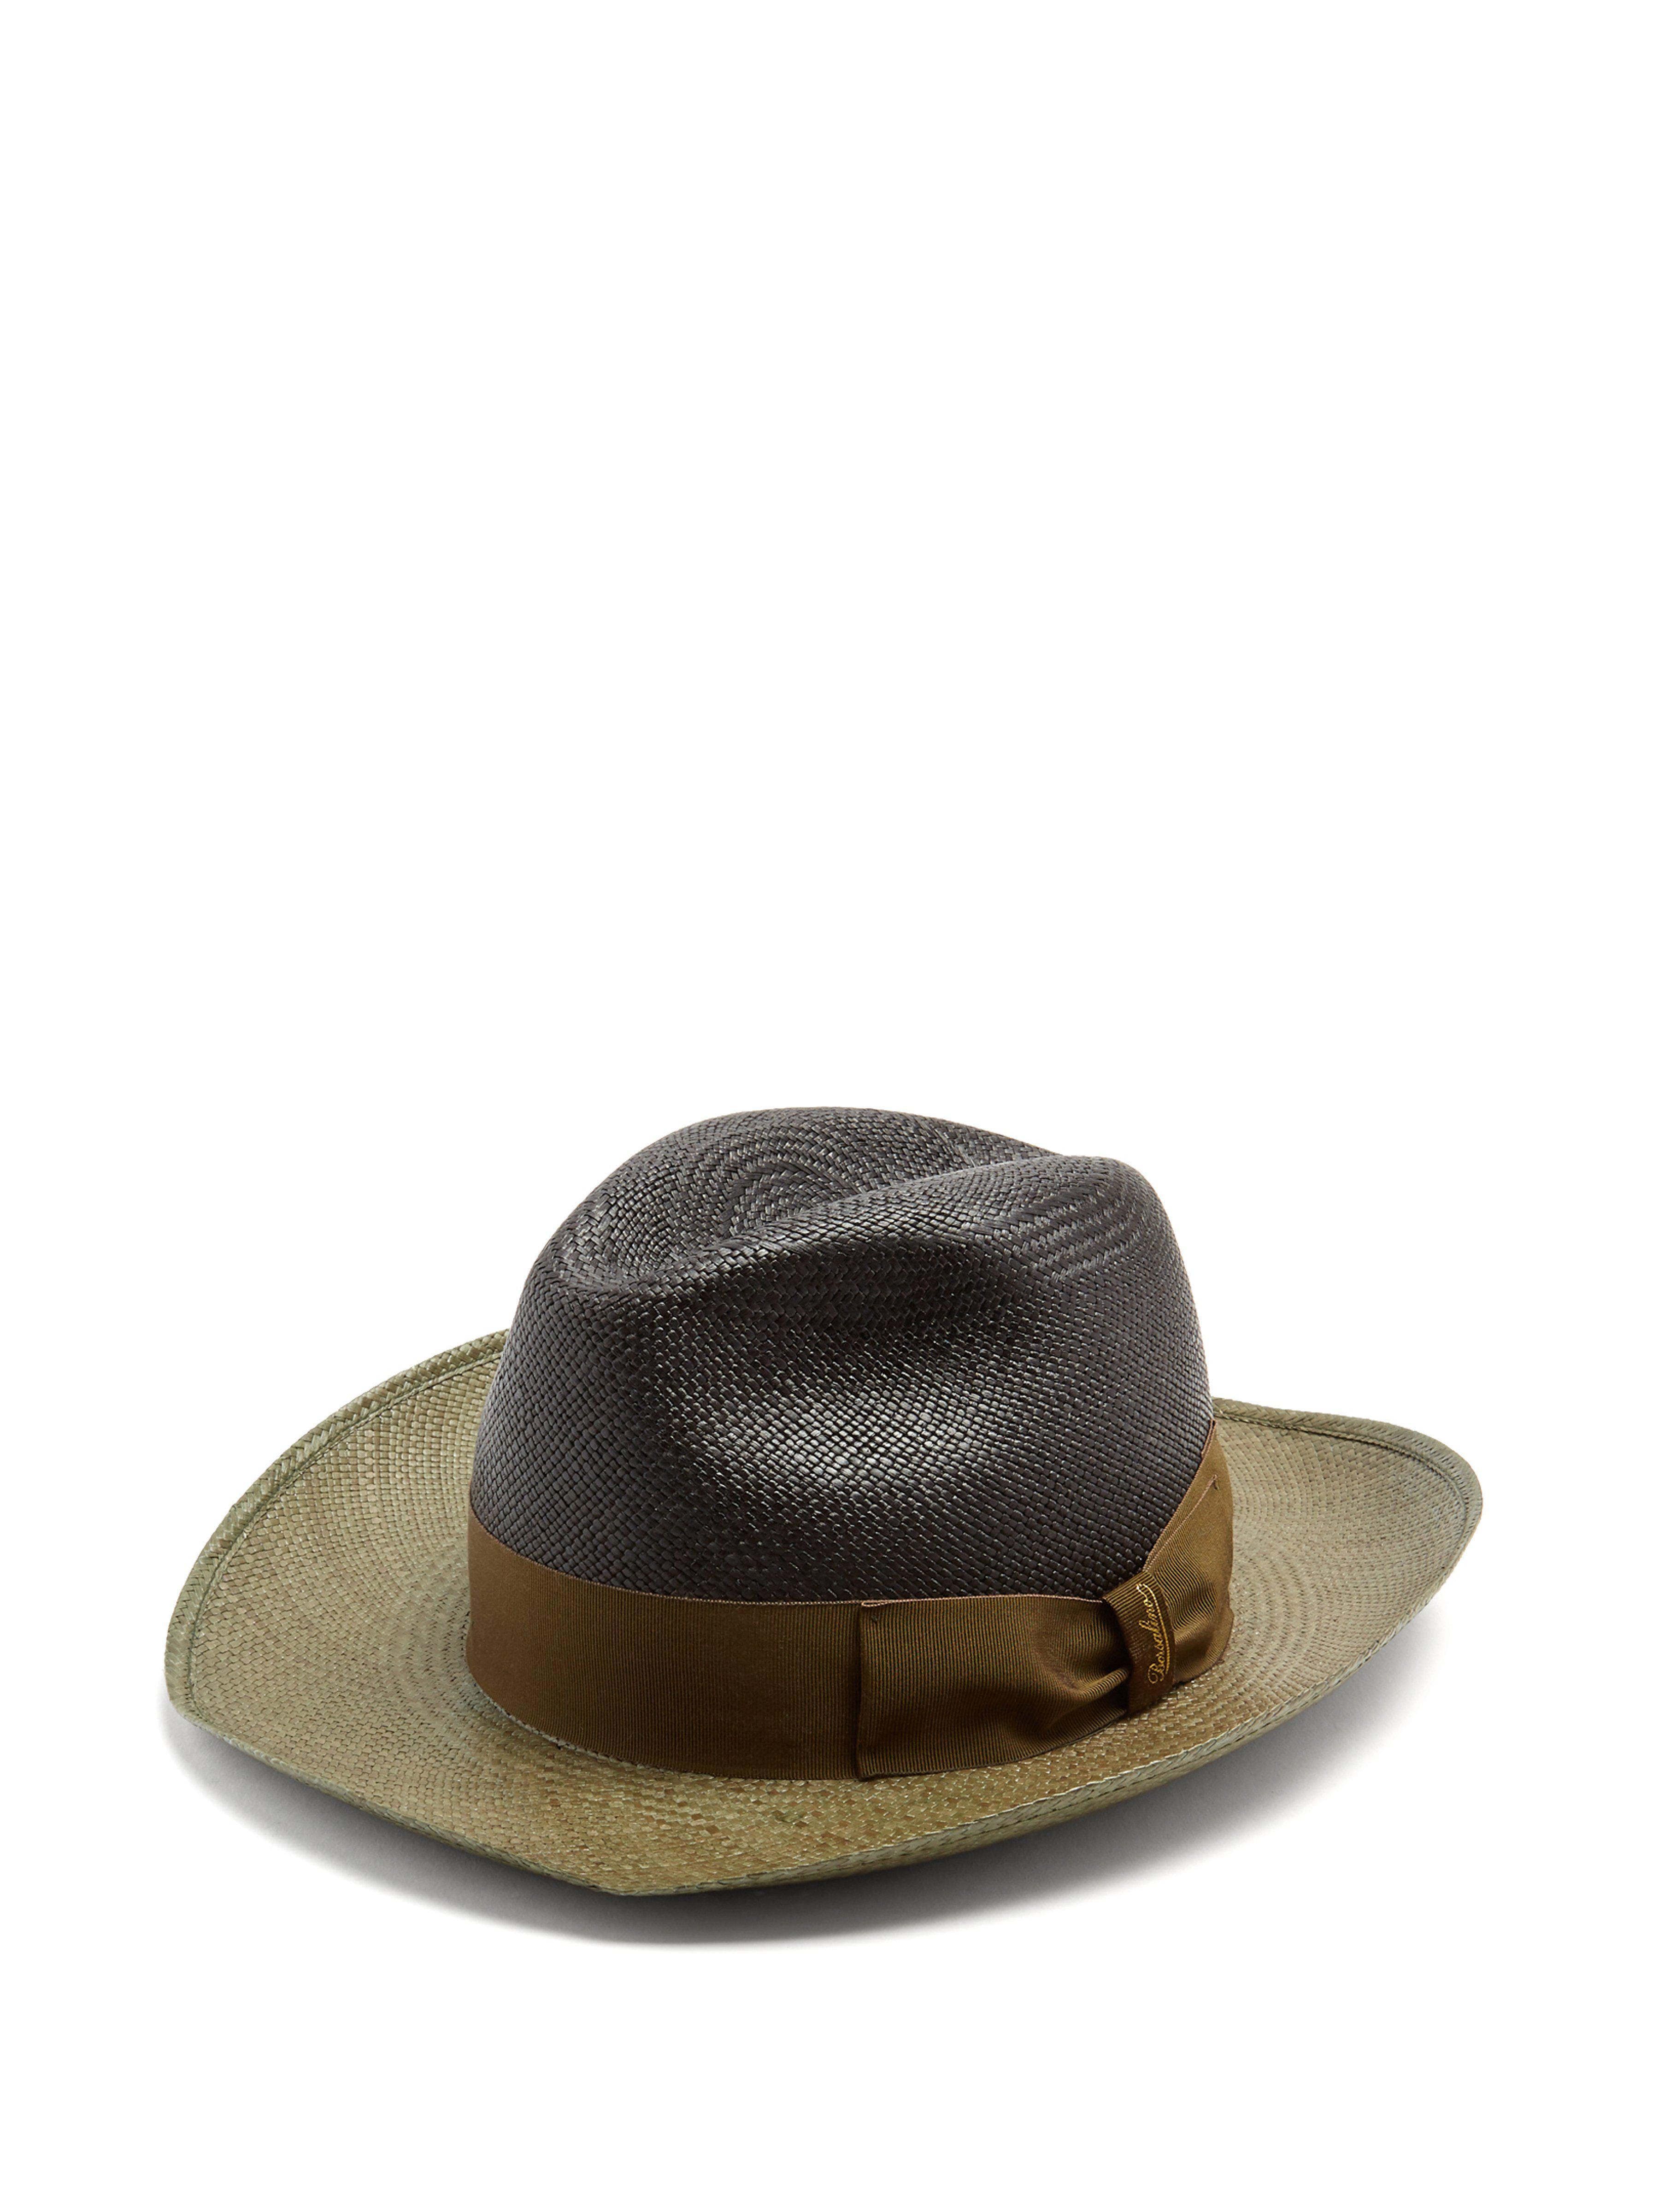 3c1afef2372 Borsalino Bi Colour Bow Embellished Panama Hat for Men - Lyst